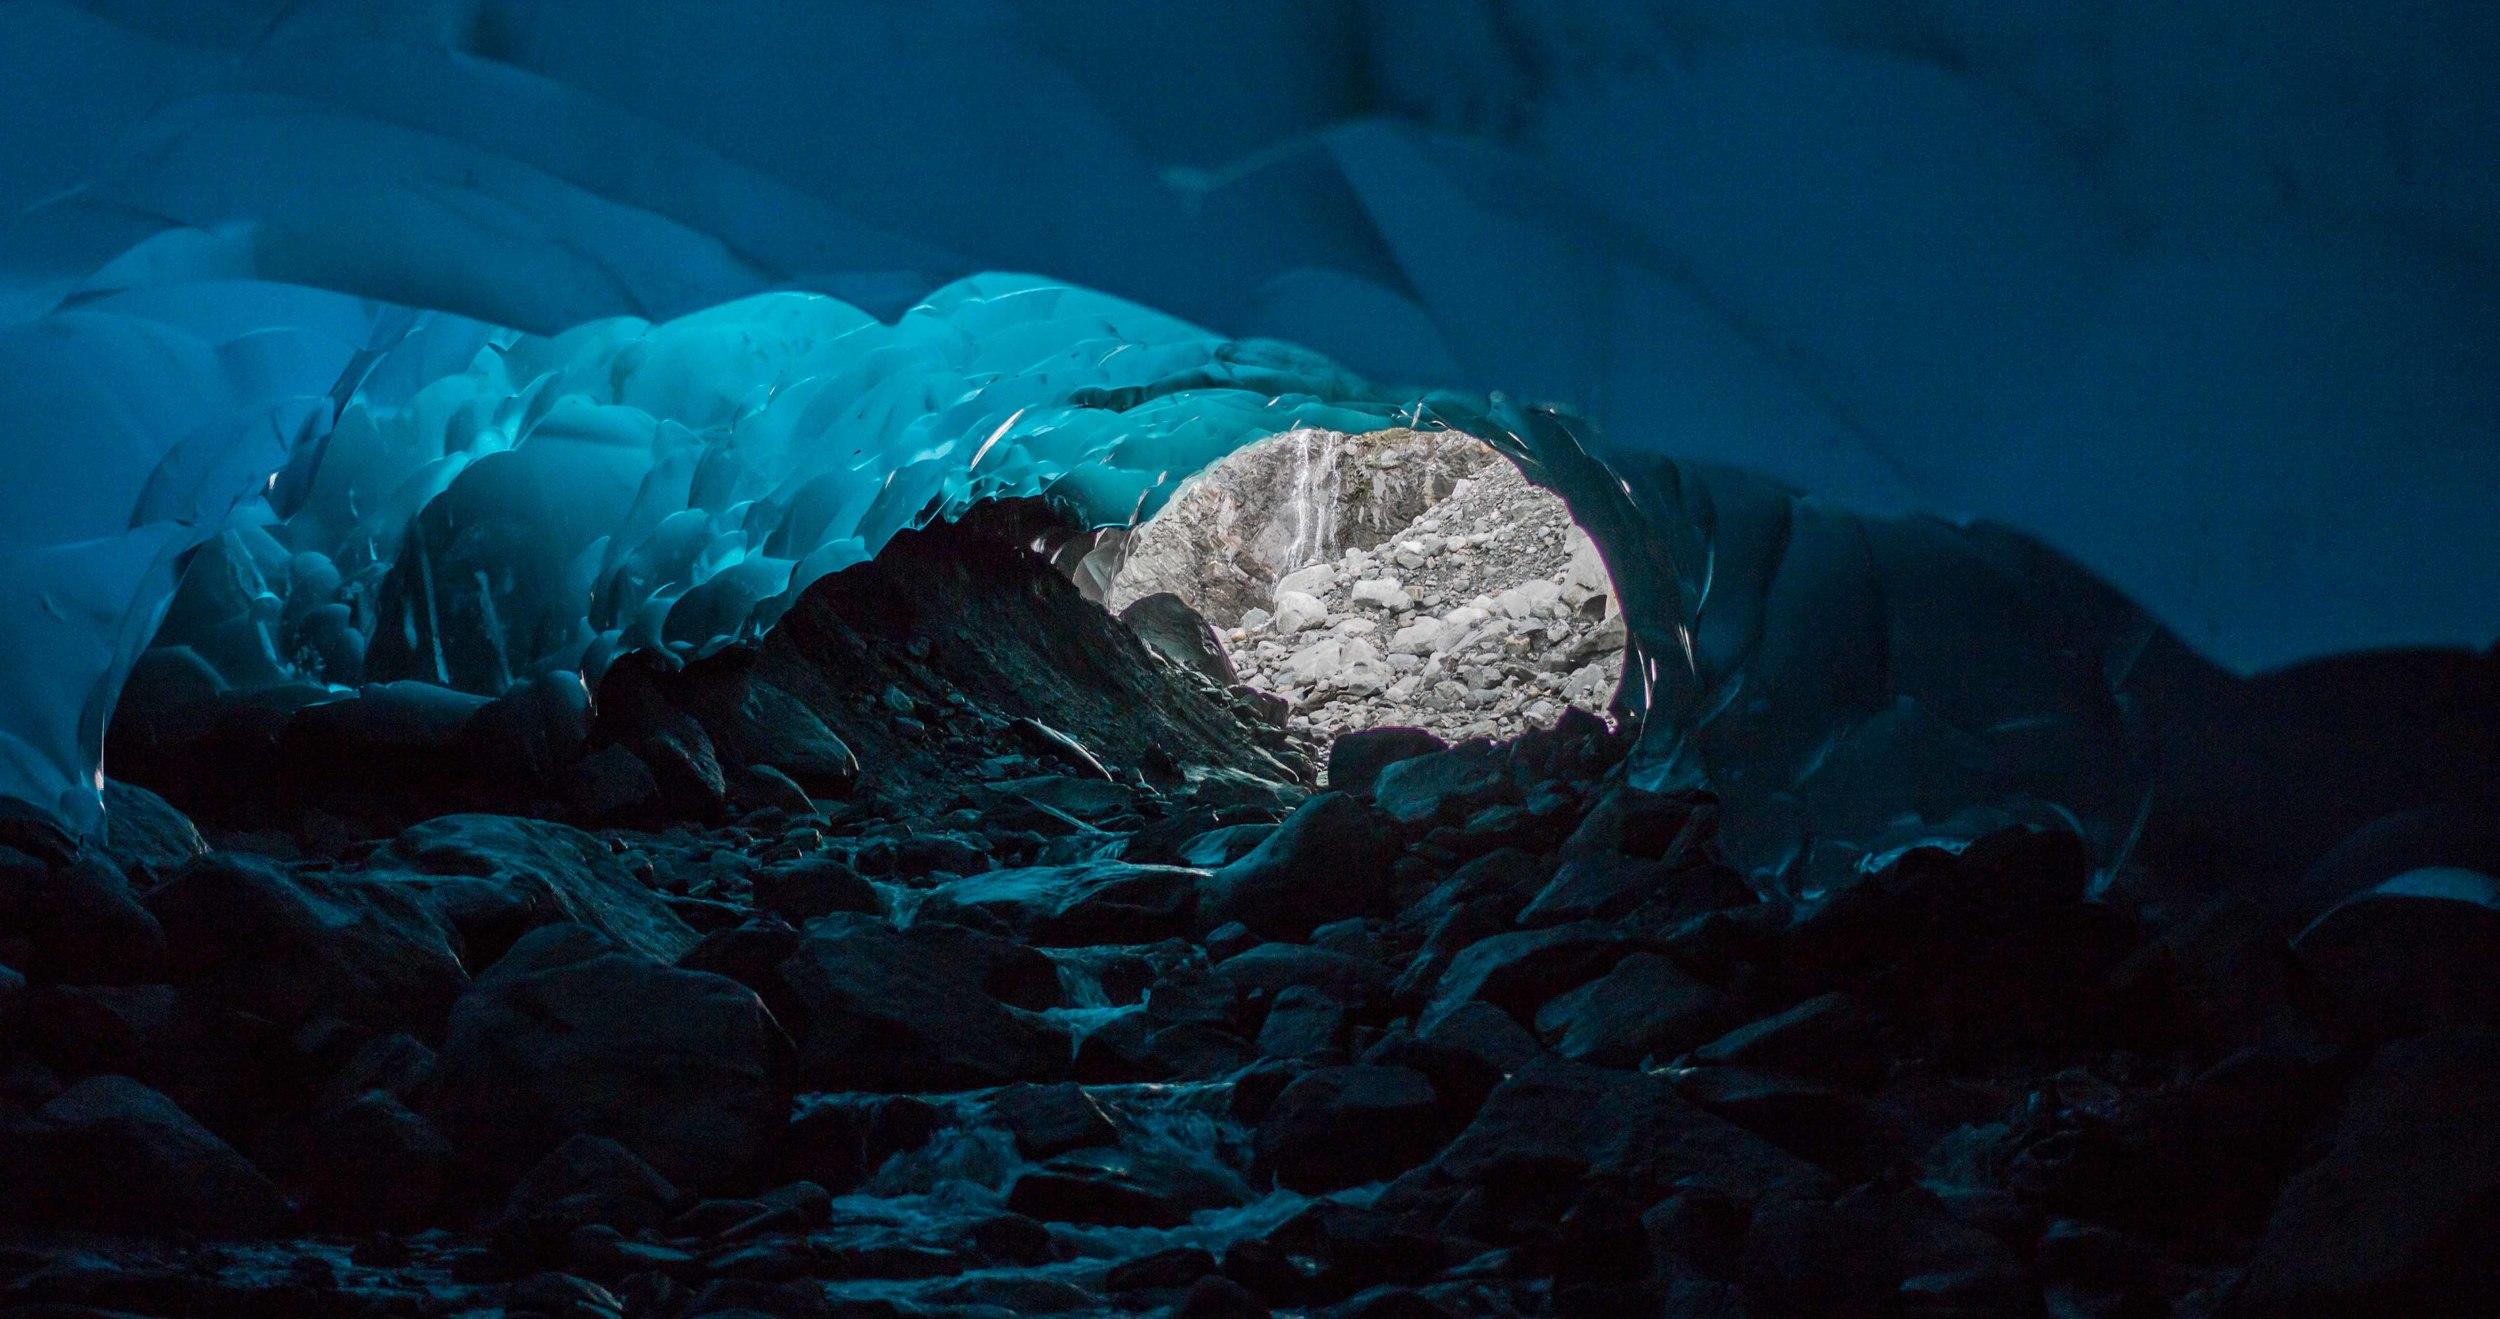 171b_ice_Cave.jpg